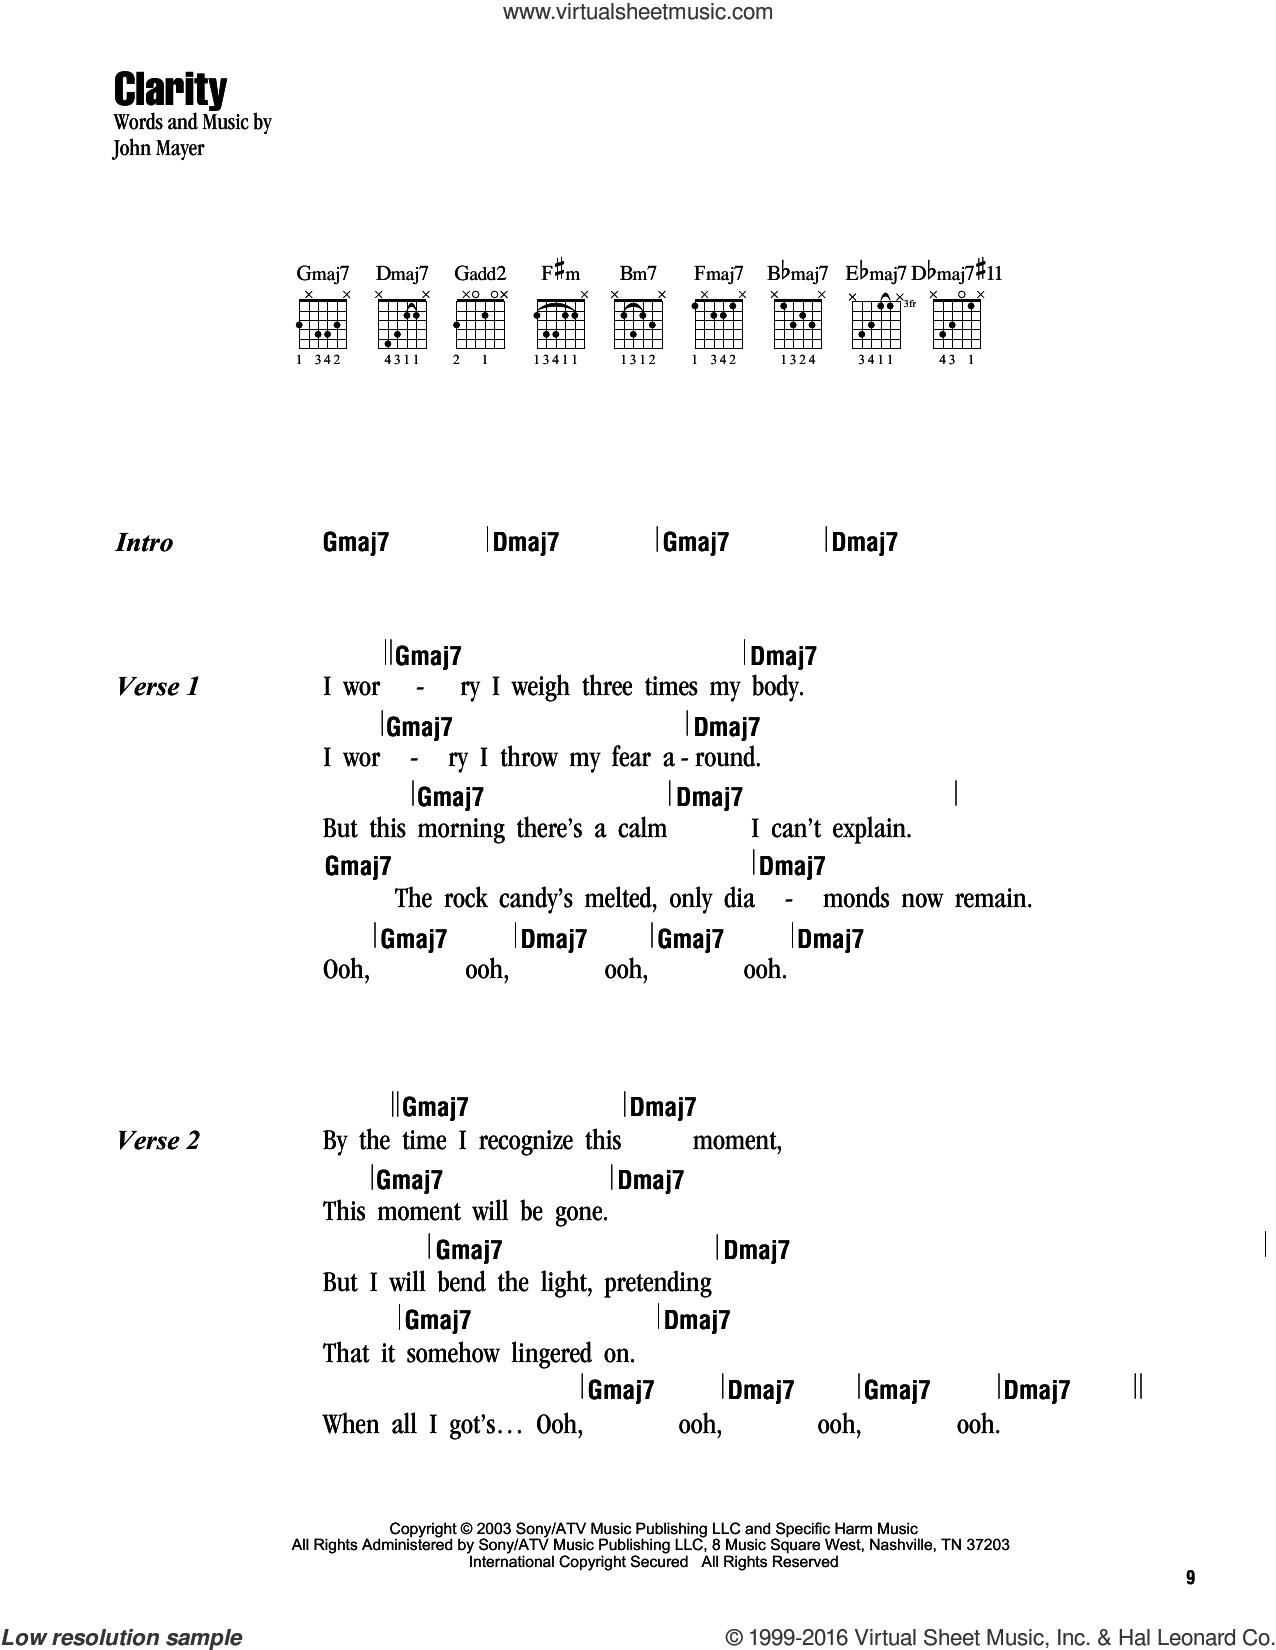 Clarity sheet music for guitar (chords) by John Mayer, intermediate skill level